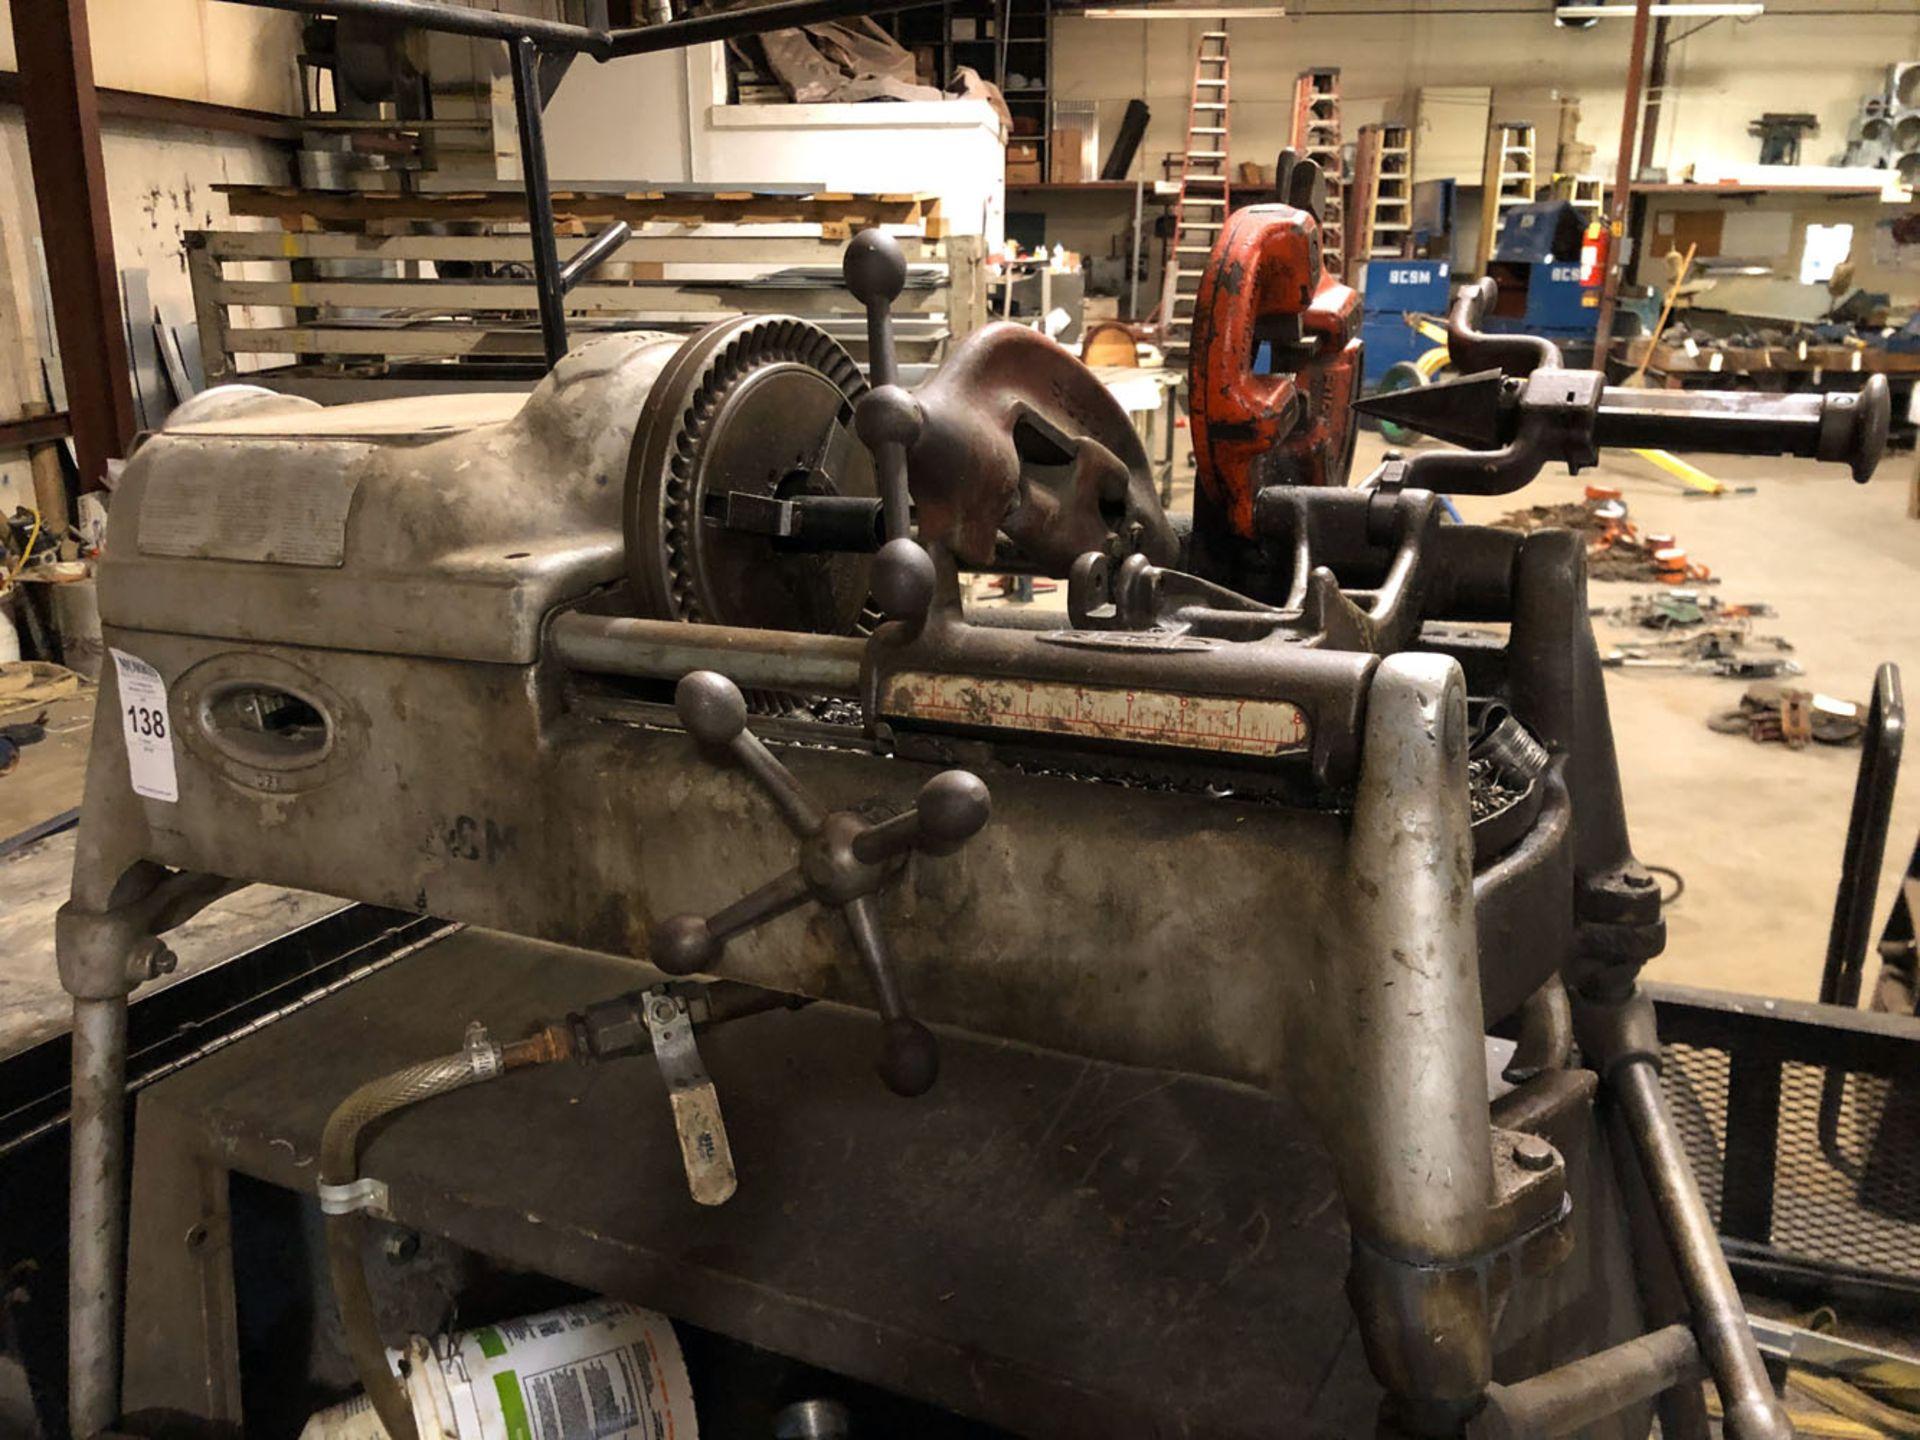 Lot 138 - Threading Machine